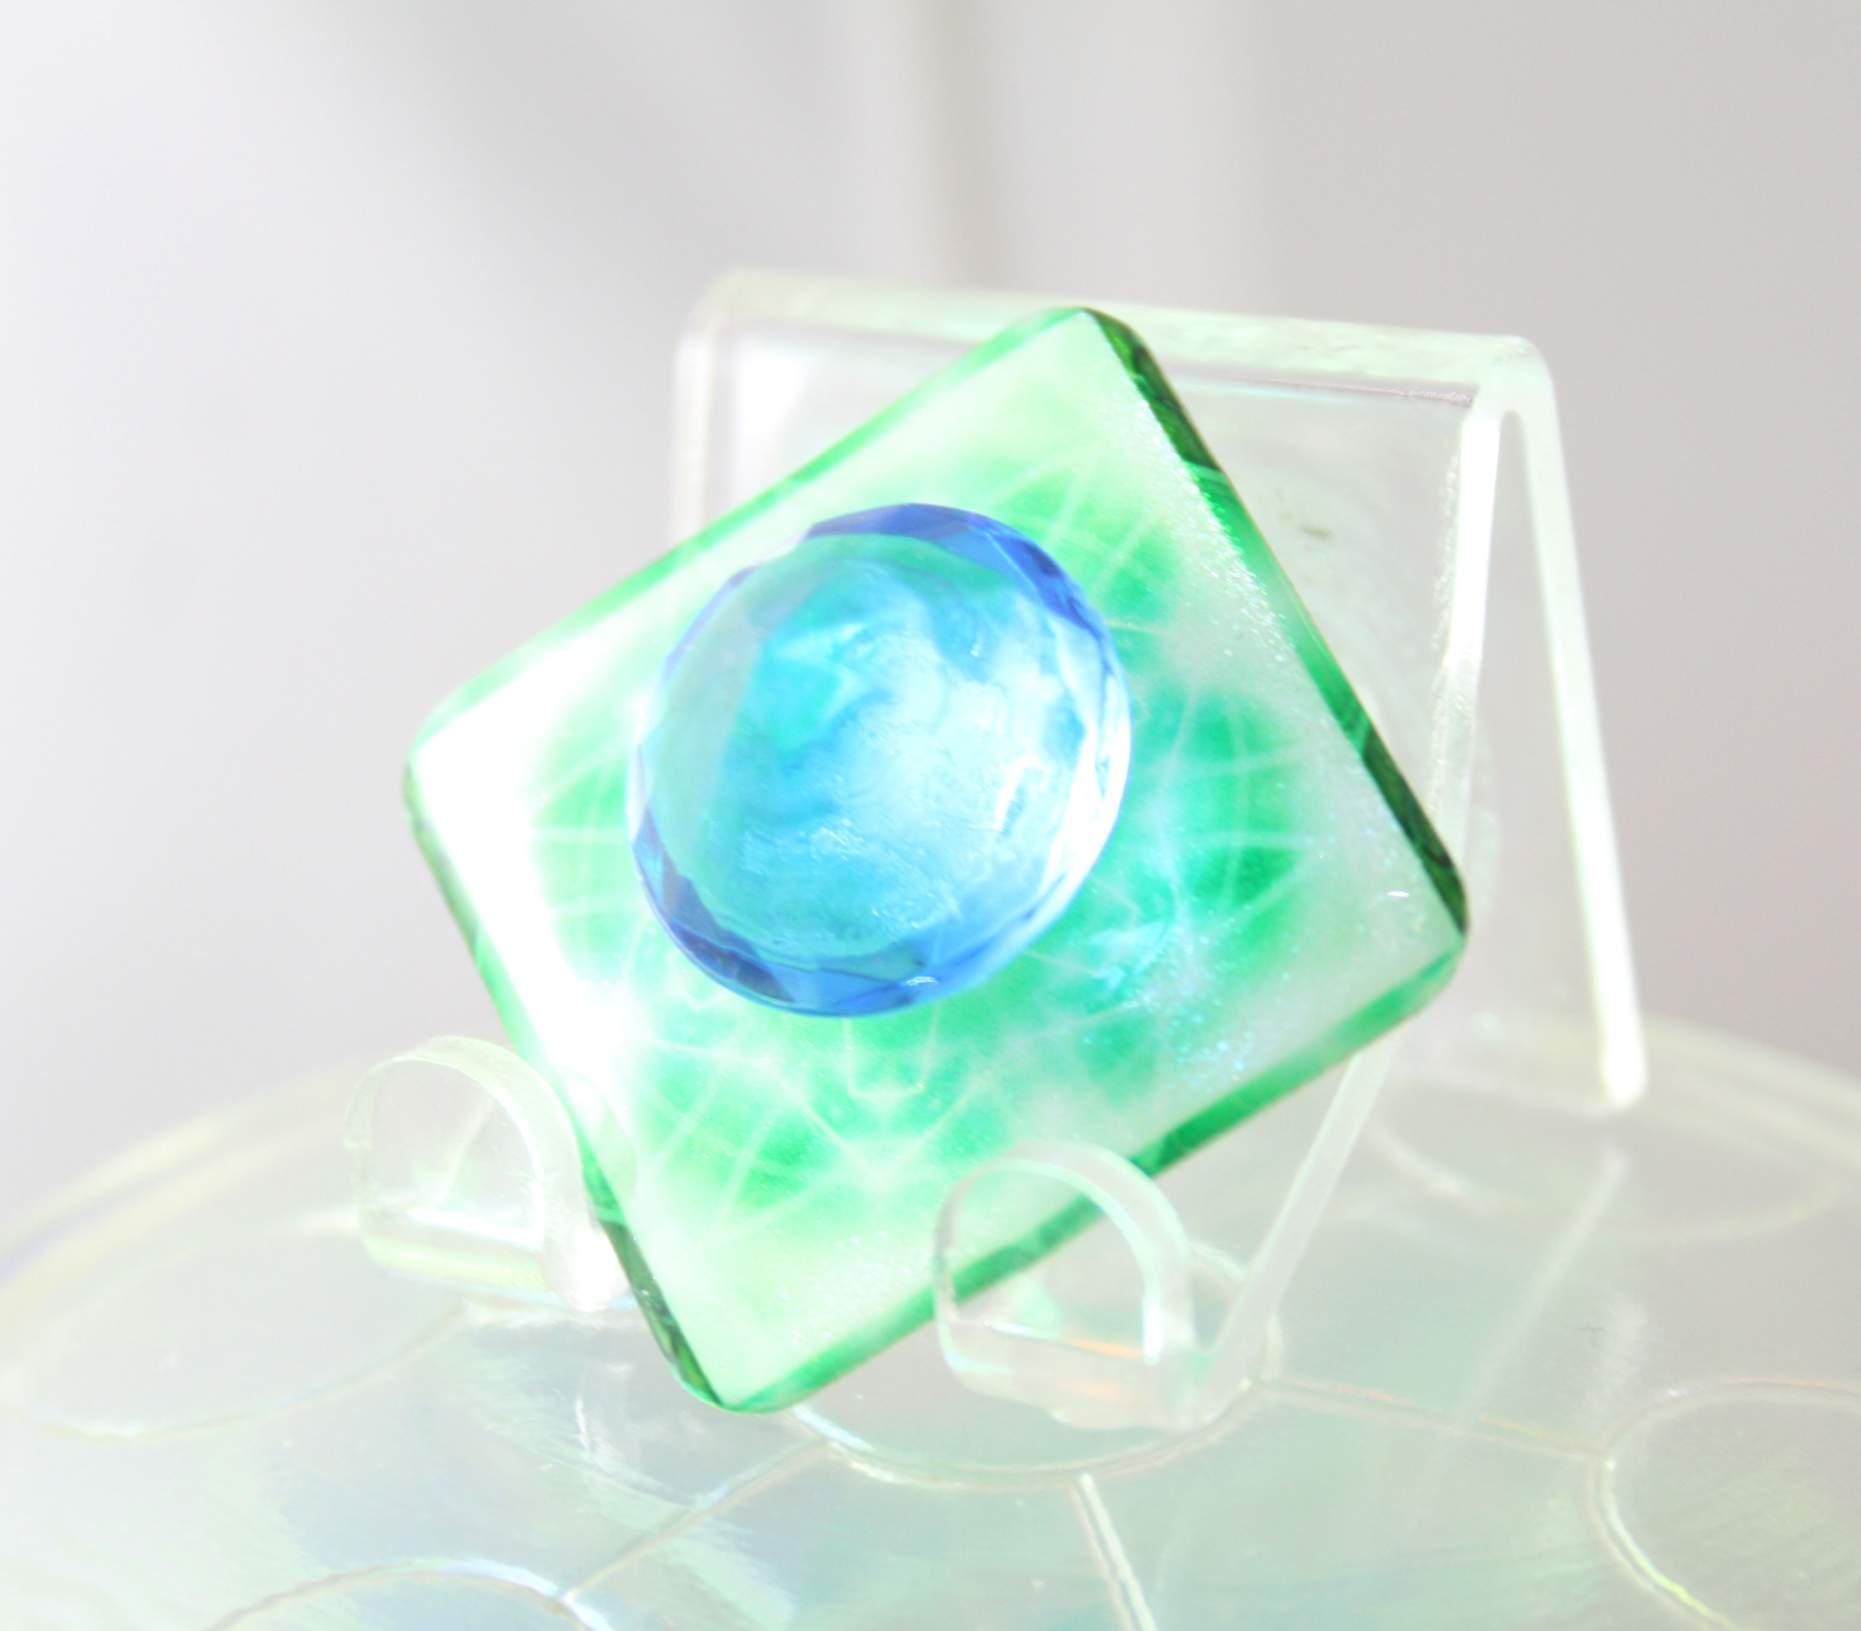 pure_infinite_green-singleflat-blue01